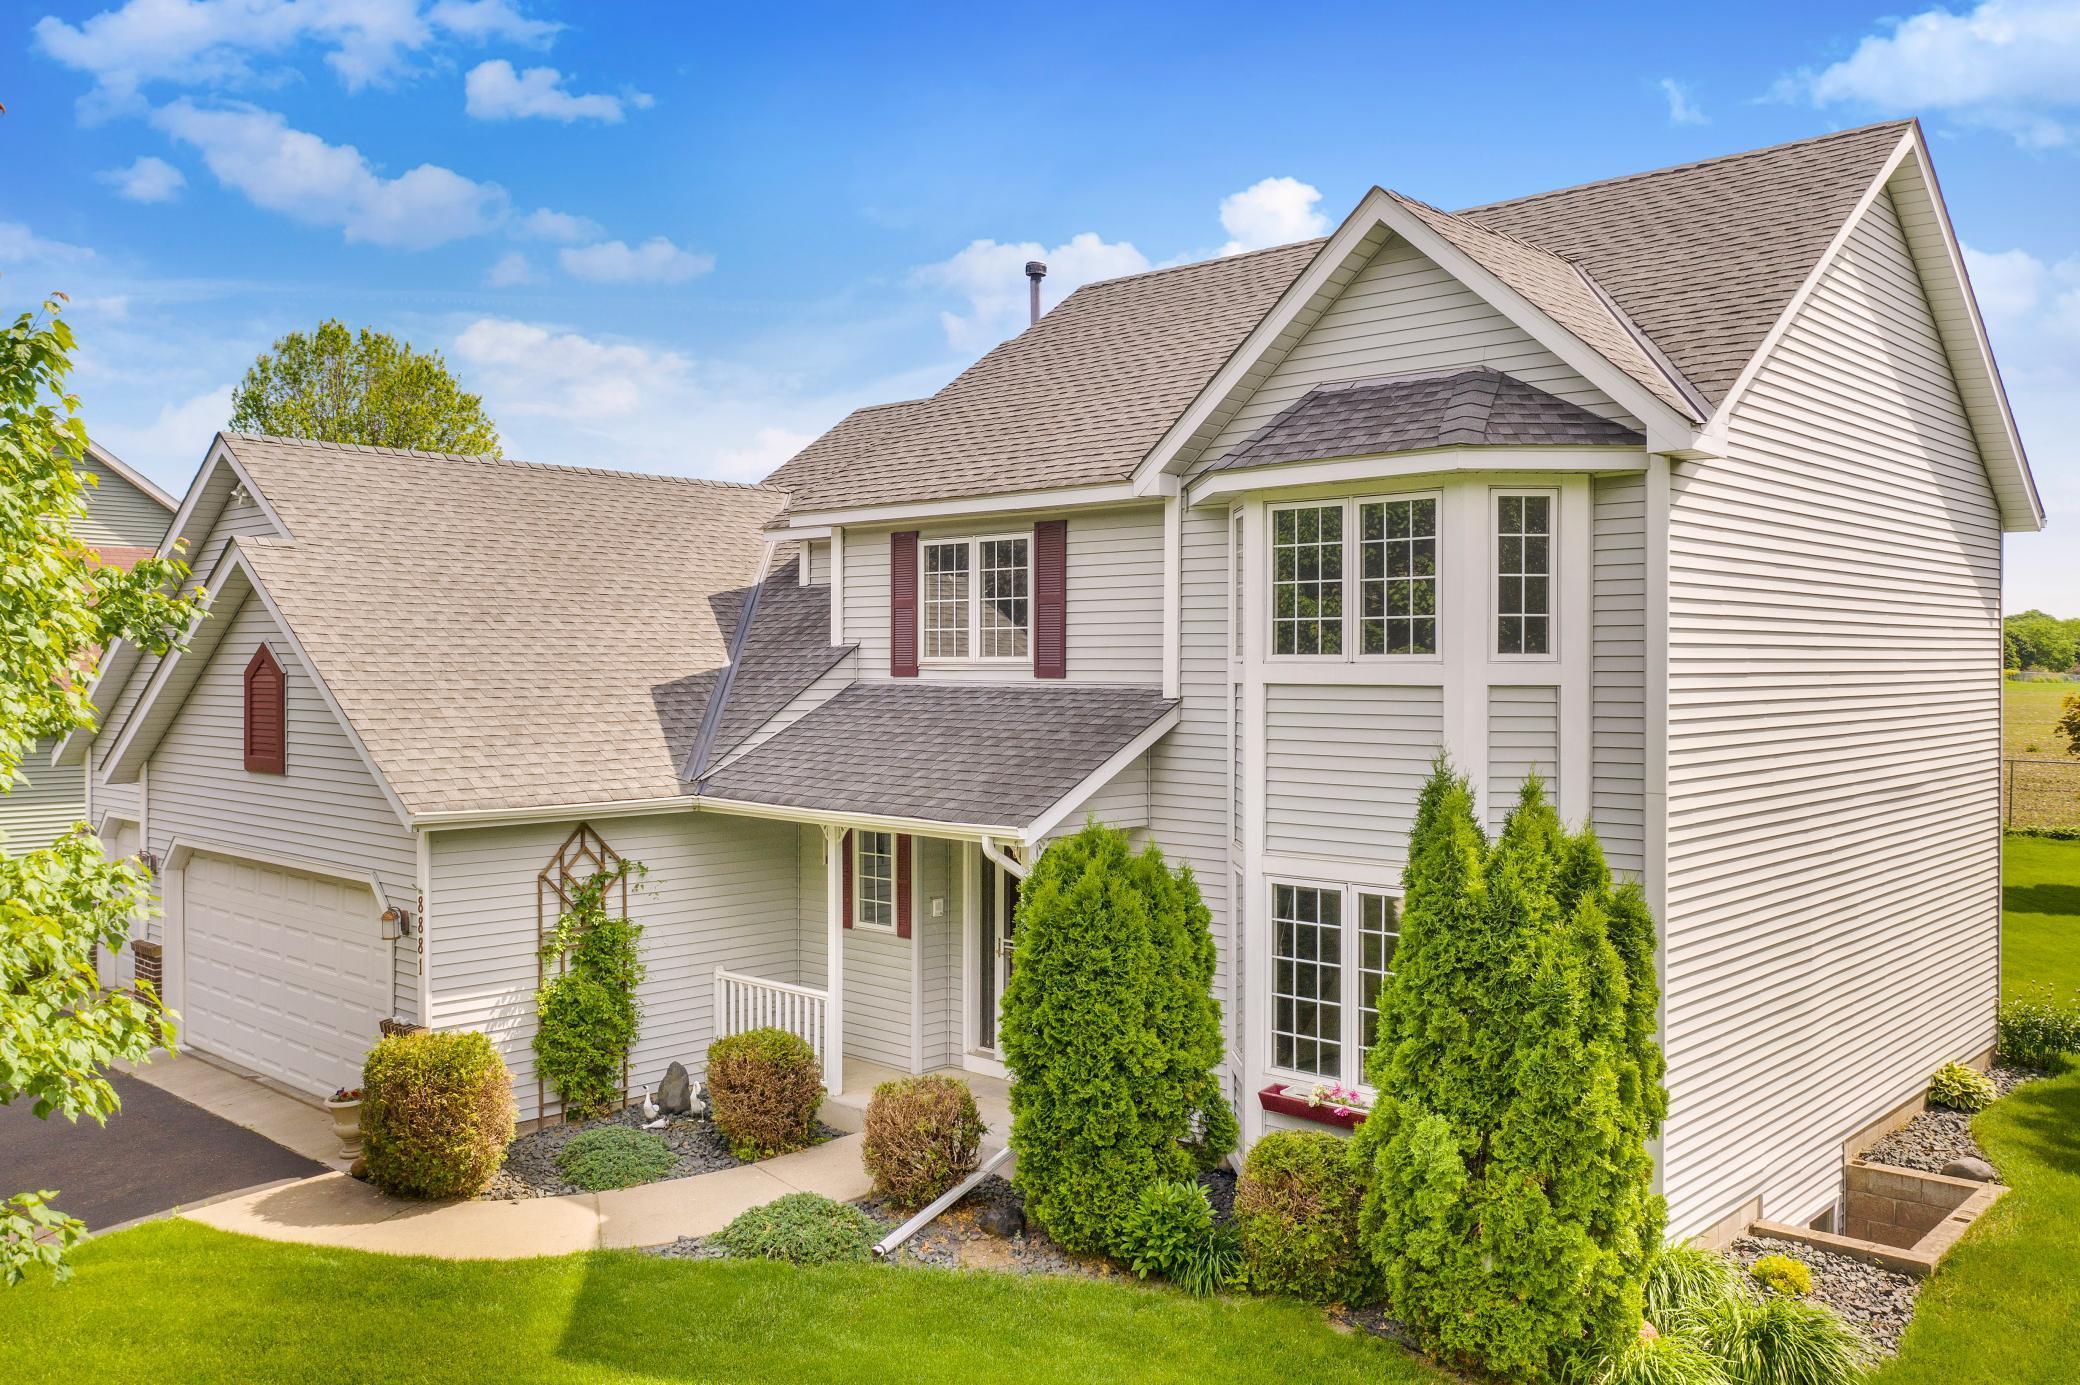 8881 Jewel Avenue S, Cottage Grove, MN 55016